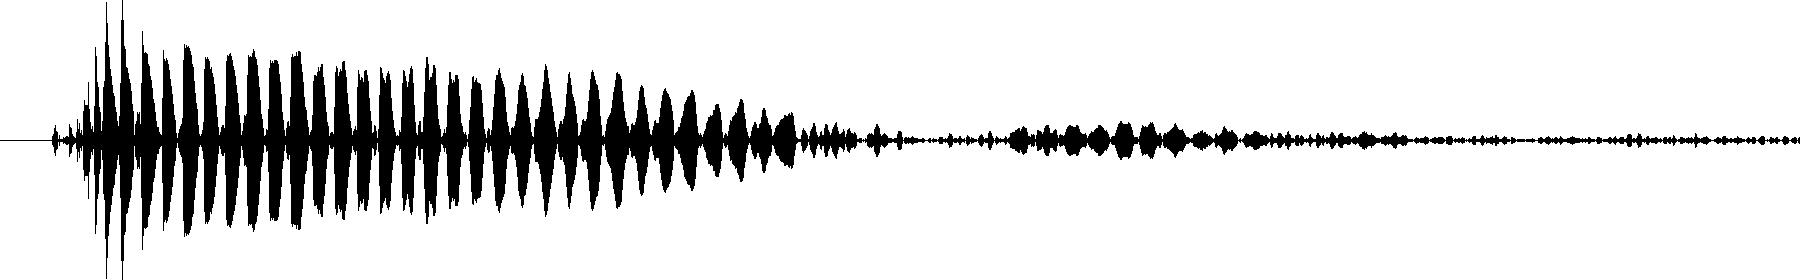 perc 1 56